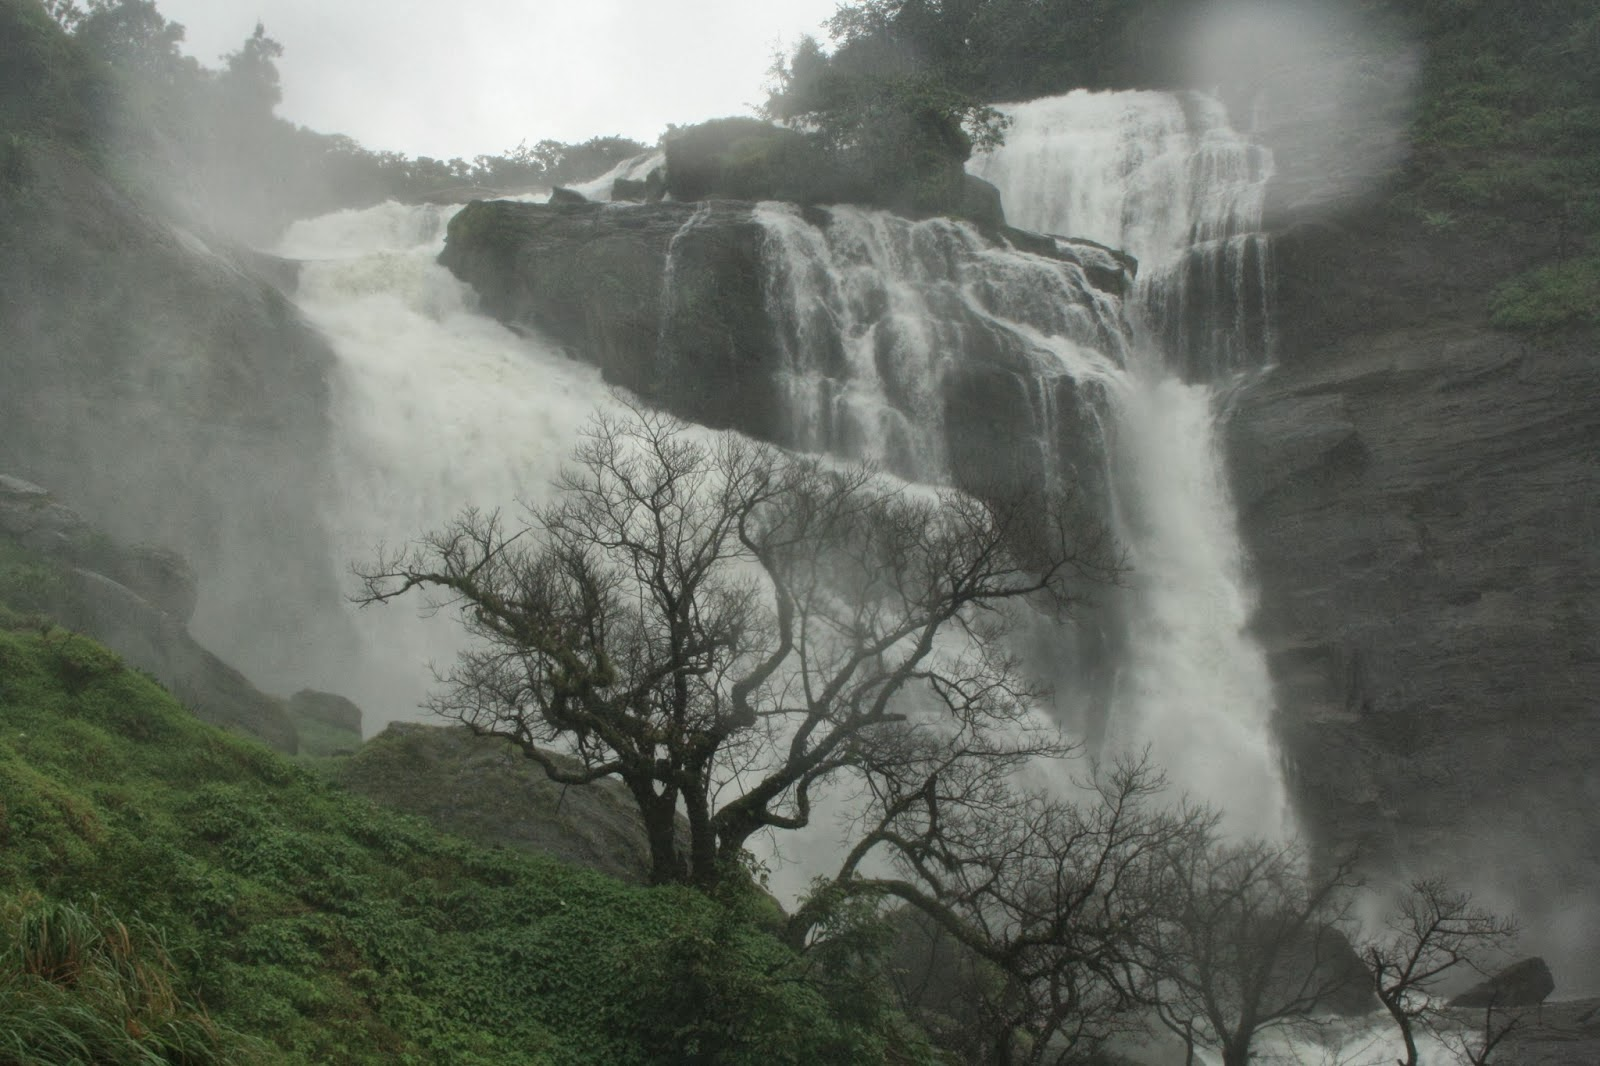 Coorg waterfalls, Mallali waterfall